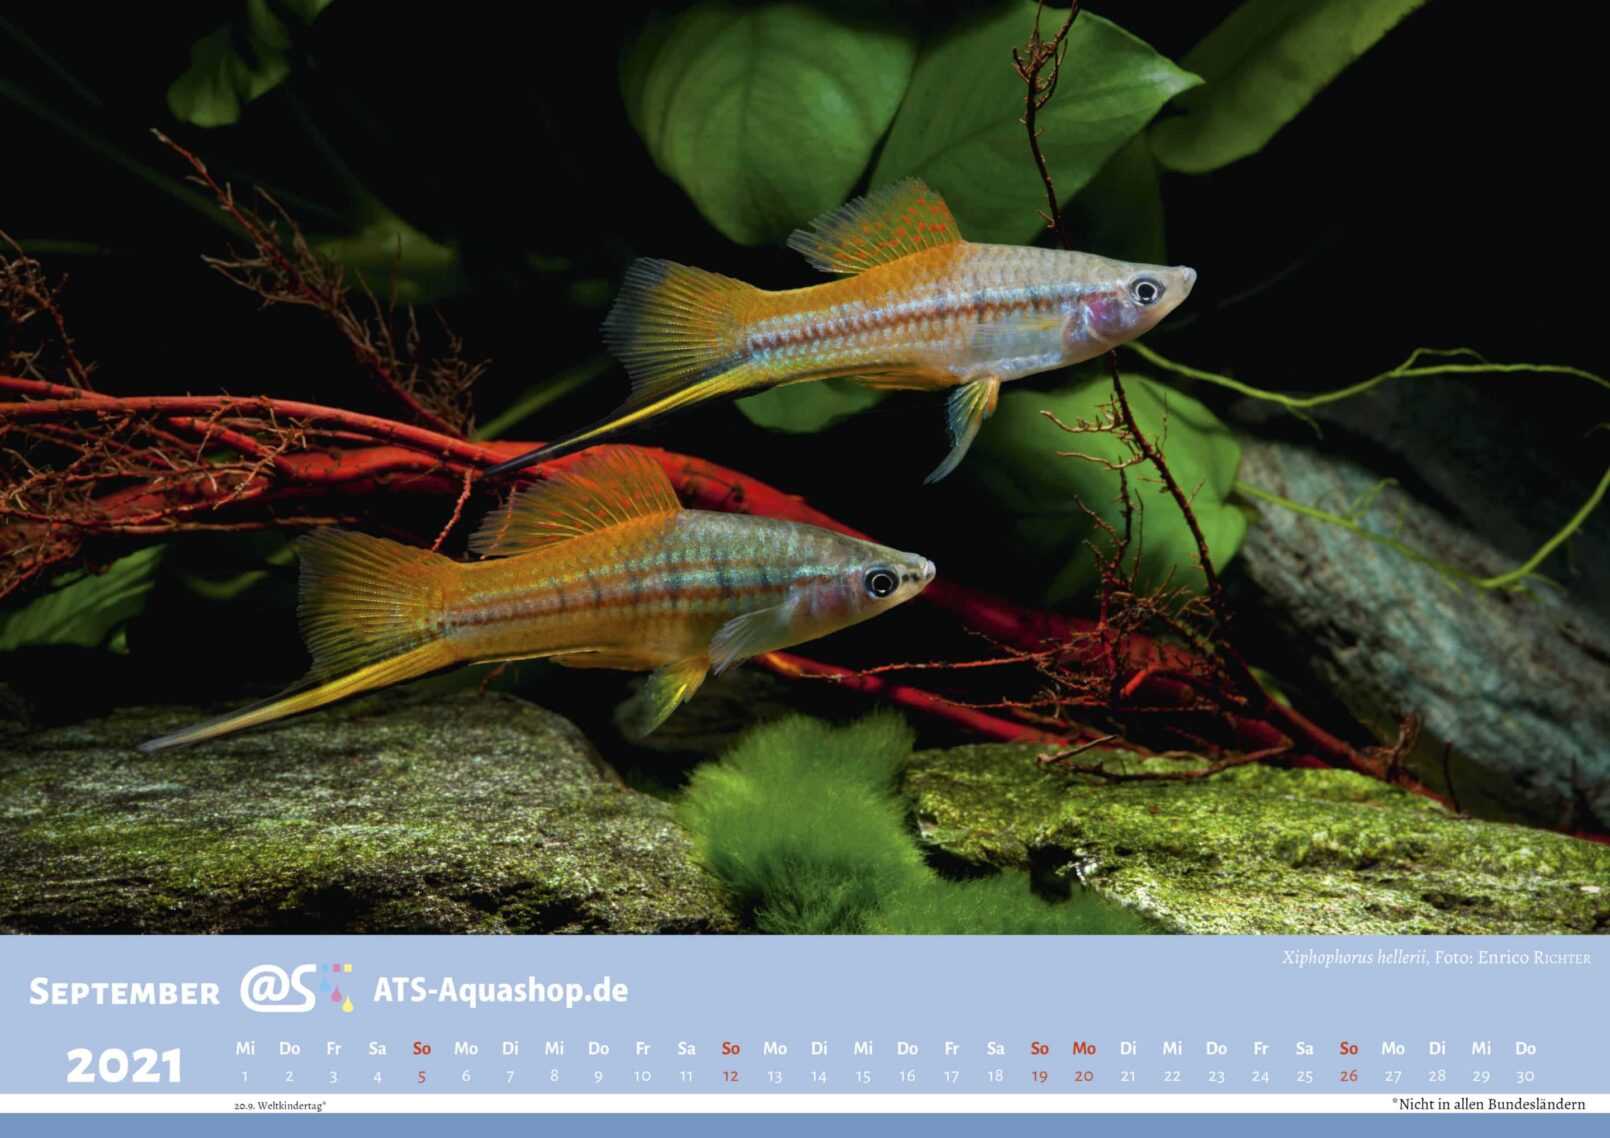 ATS-Aquashop Foto Jahreskalender 2021 DIN A3 (September): Xiphophorus hellerii